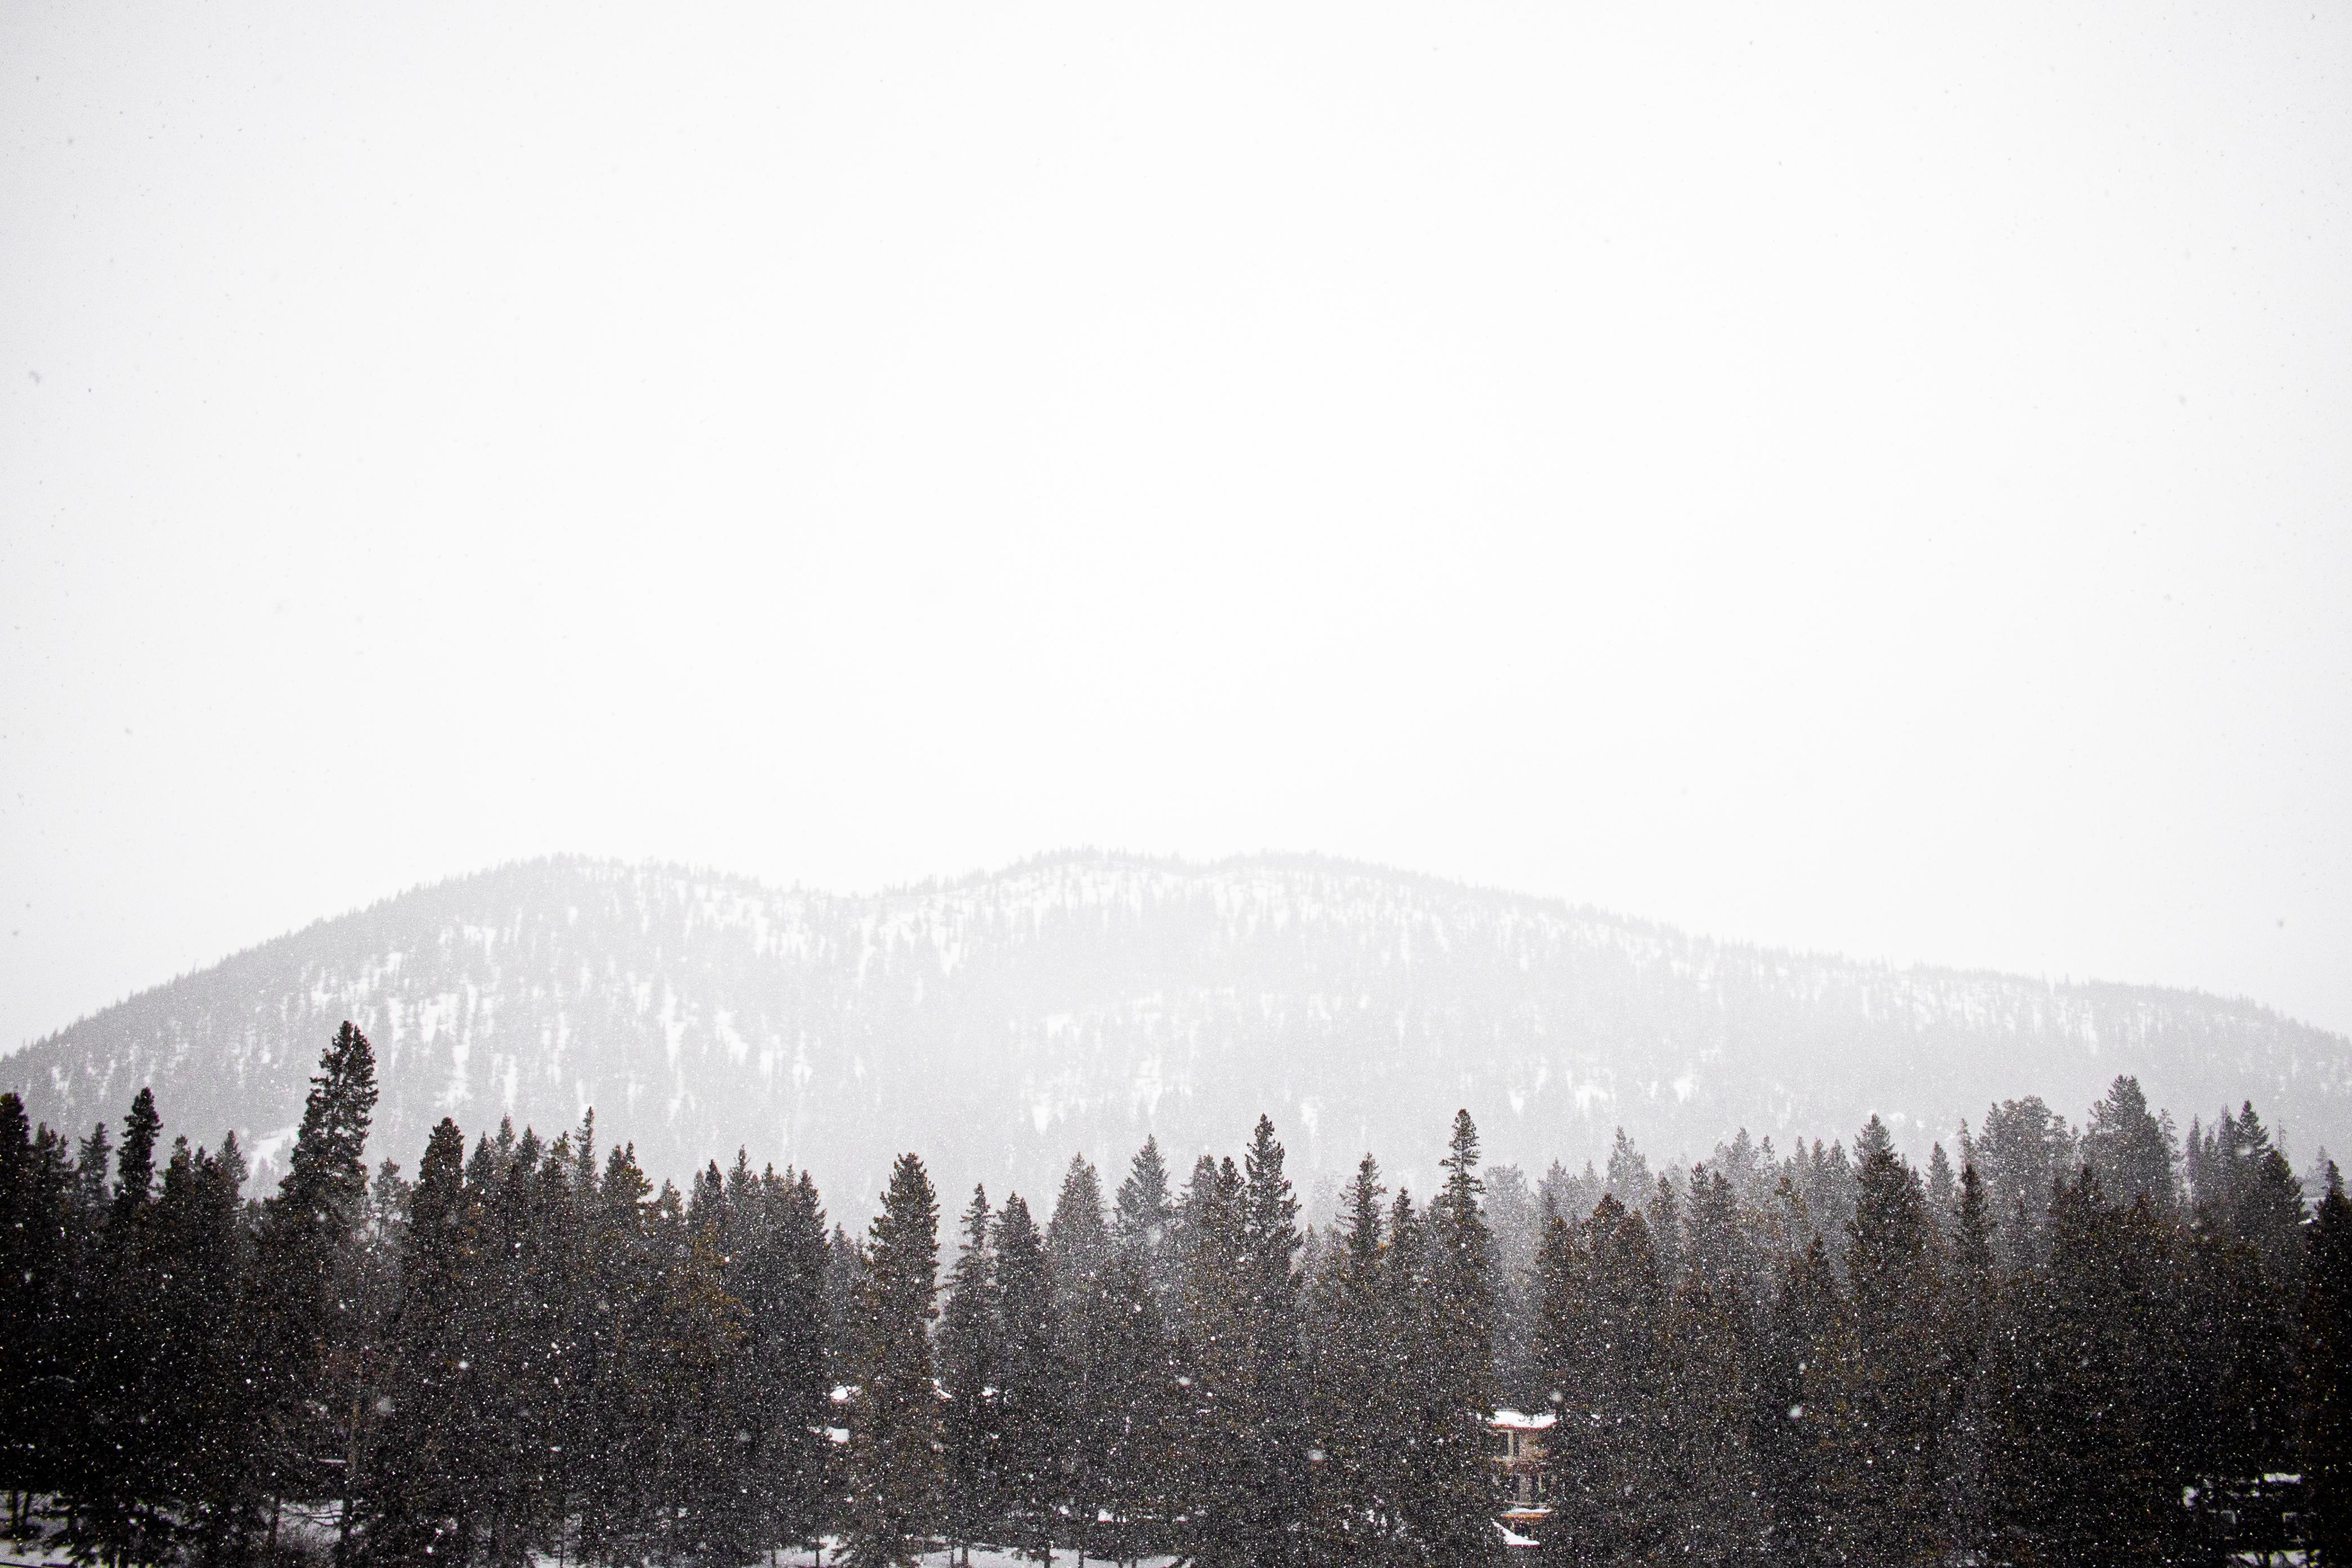 yyc photographer, Calgary photographer, Banff, Alberta, Canadian landscape, Svetlana Yanova,